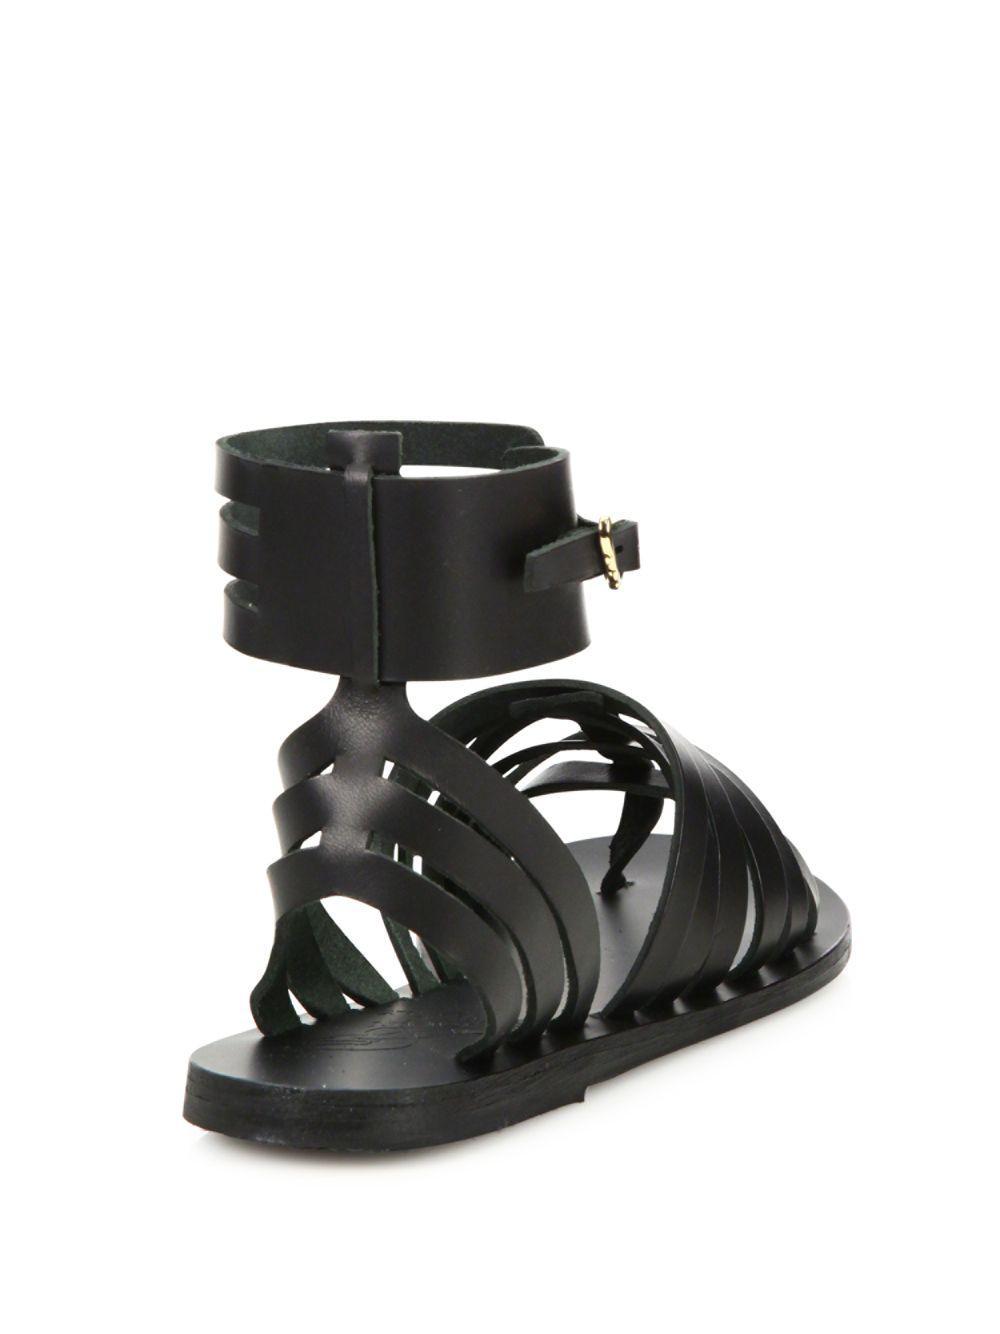 cfc2dac184b Lyst - Ancient Greek Sandals Zaira Leather Gladiator Sandals in Black -  Save 29%